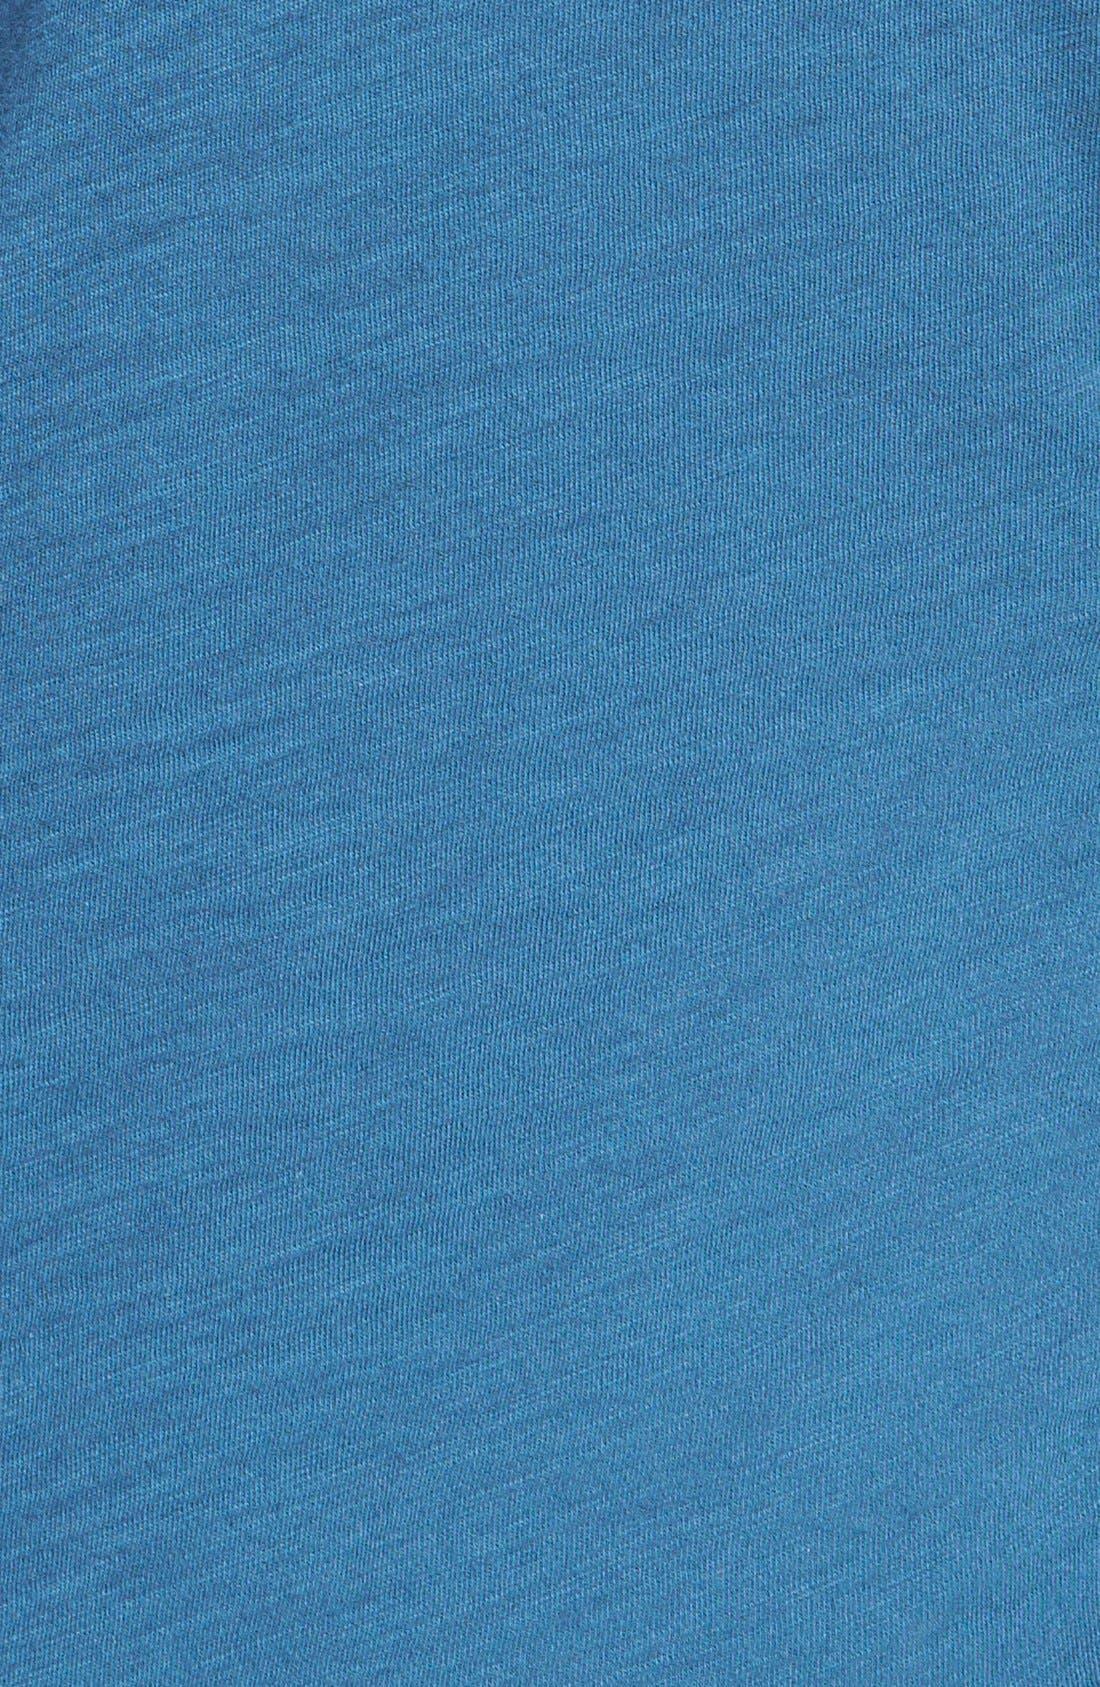 Alternate Image 3  - James Perse Sheer Slub Panel Shirt